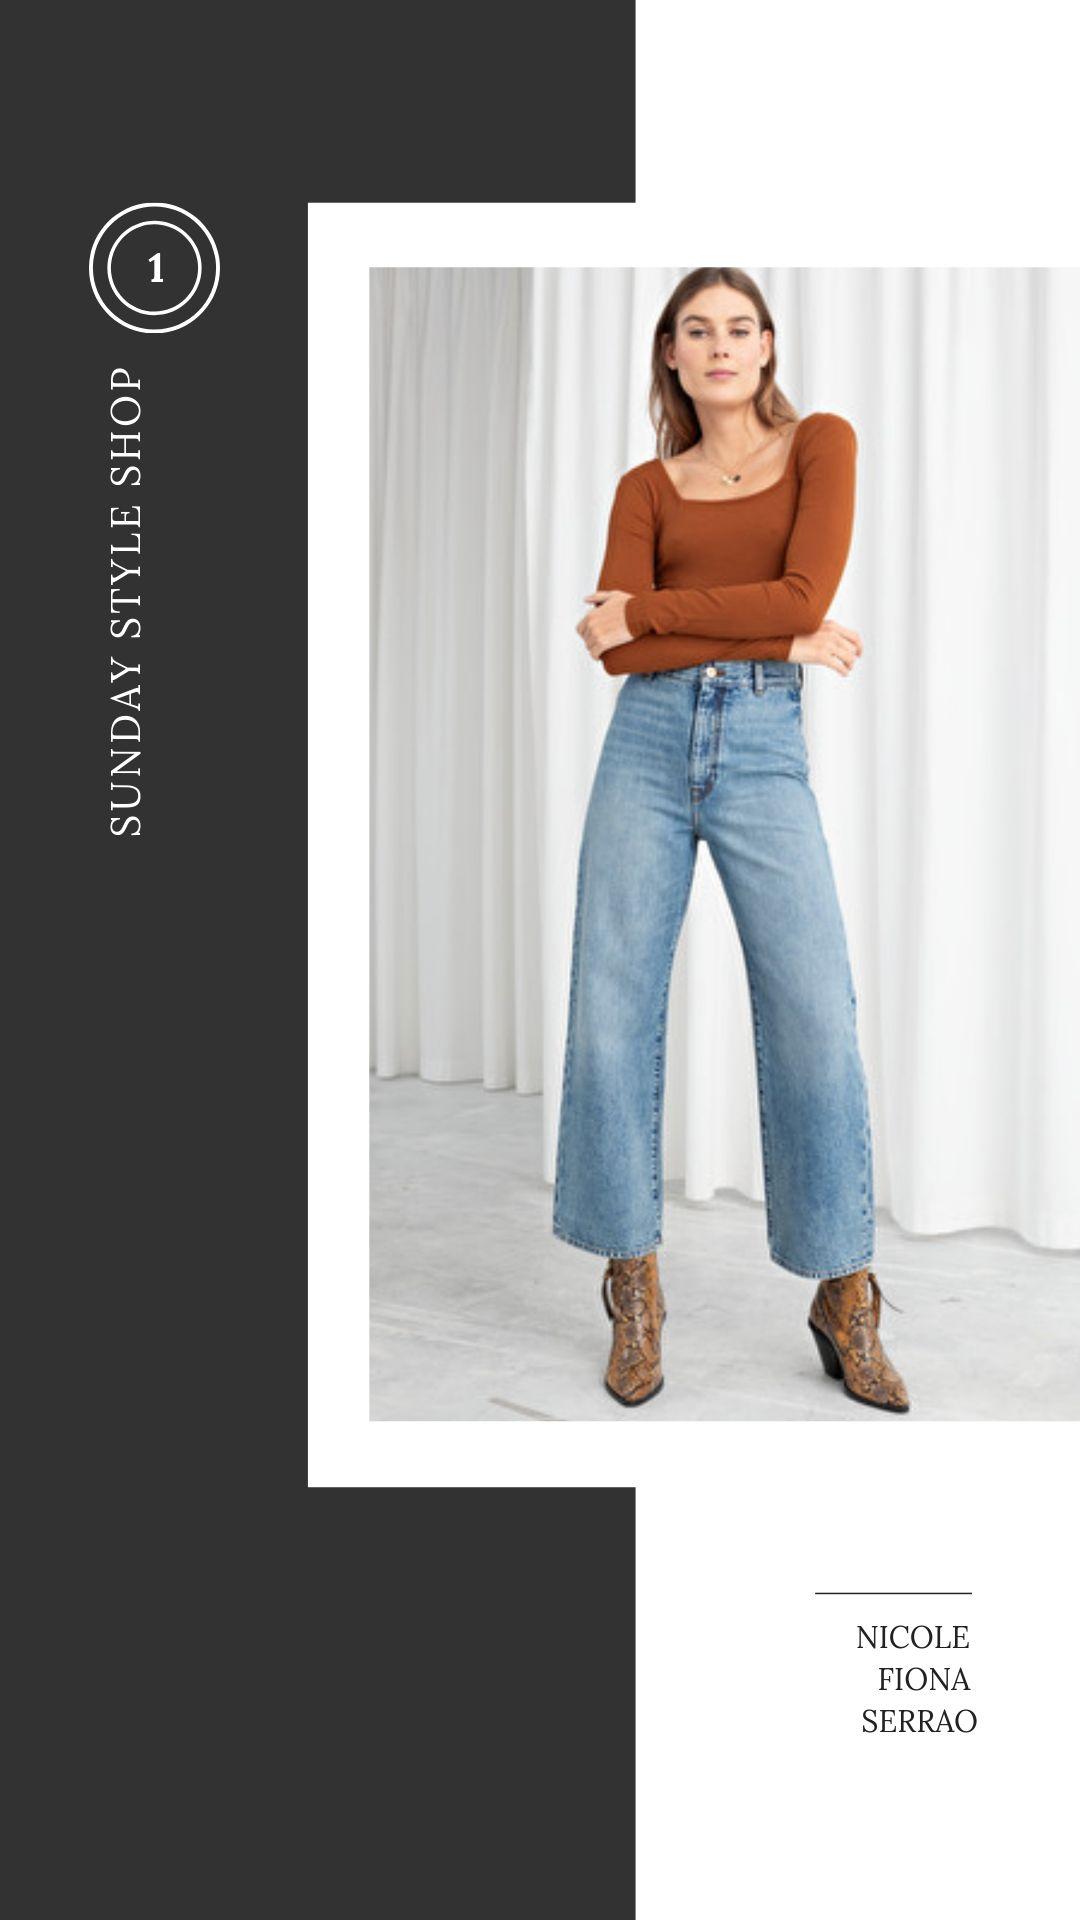 Nicole Fiona Serrao Sunday Style Shop & Other Stories